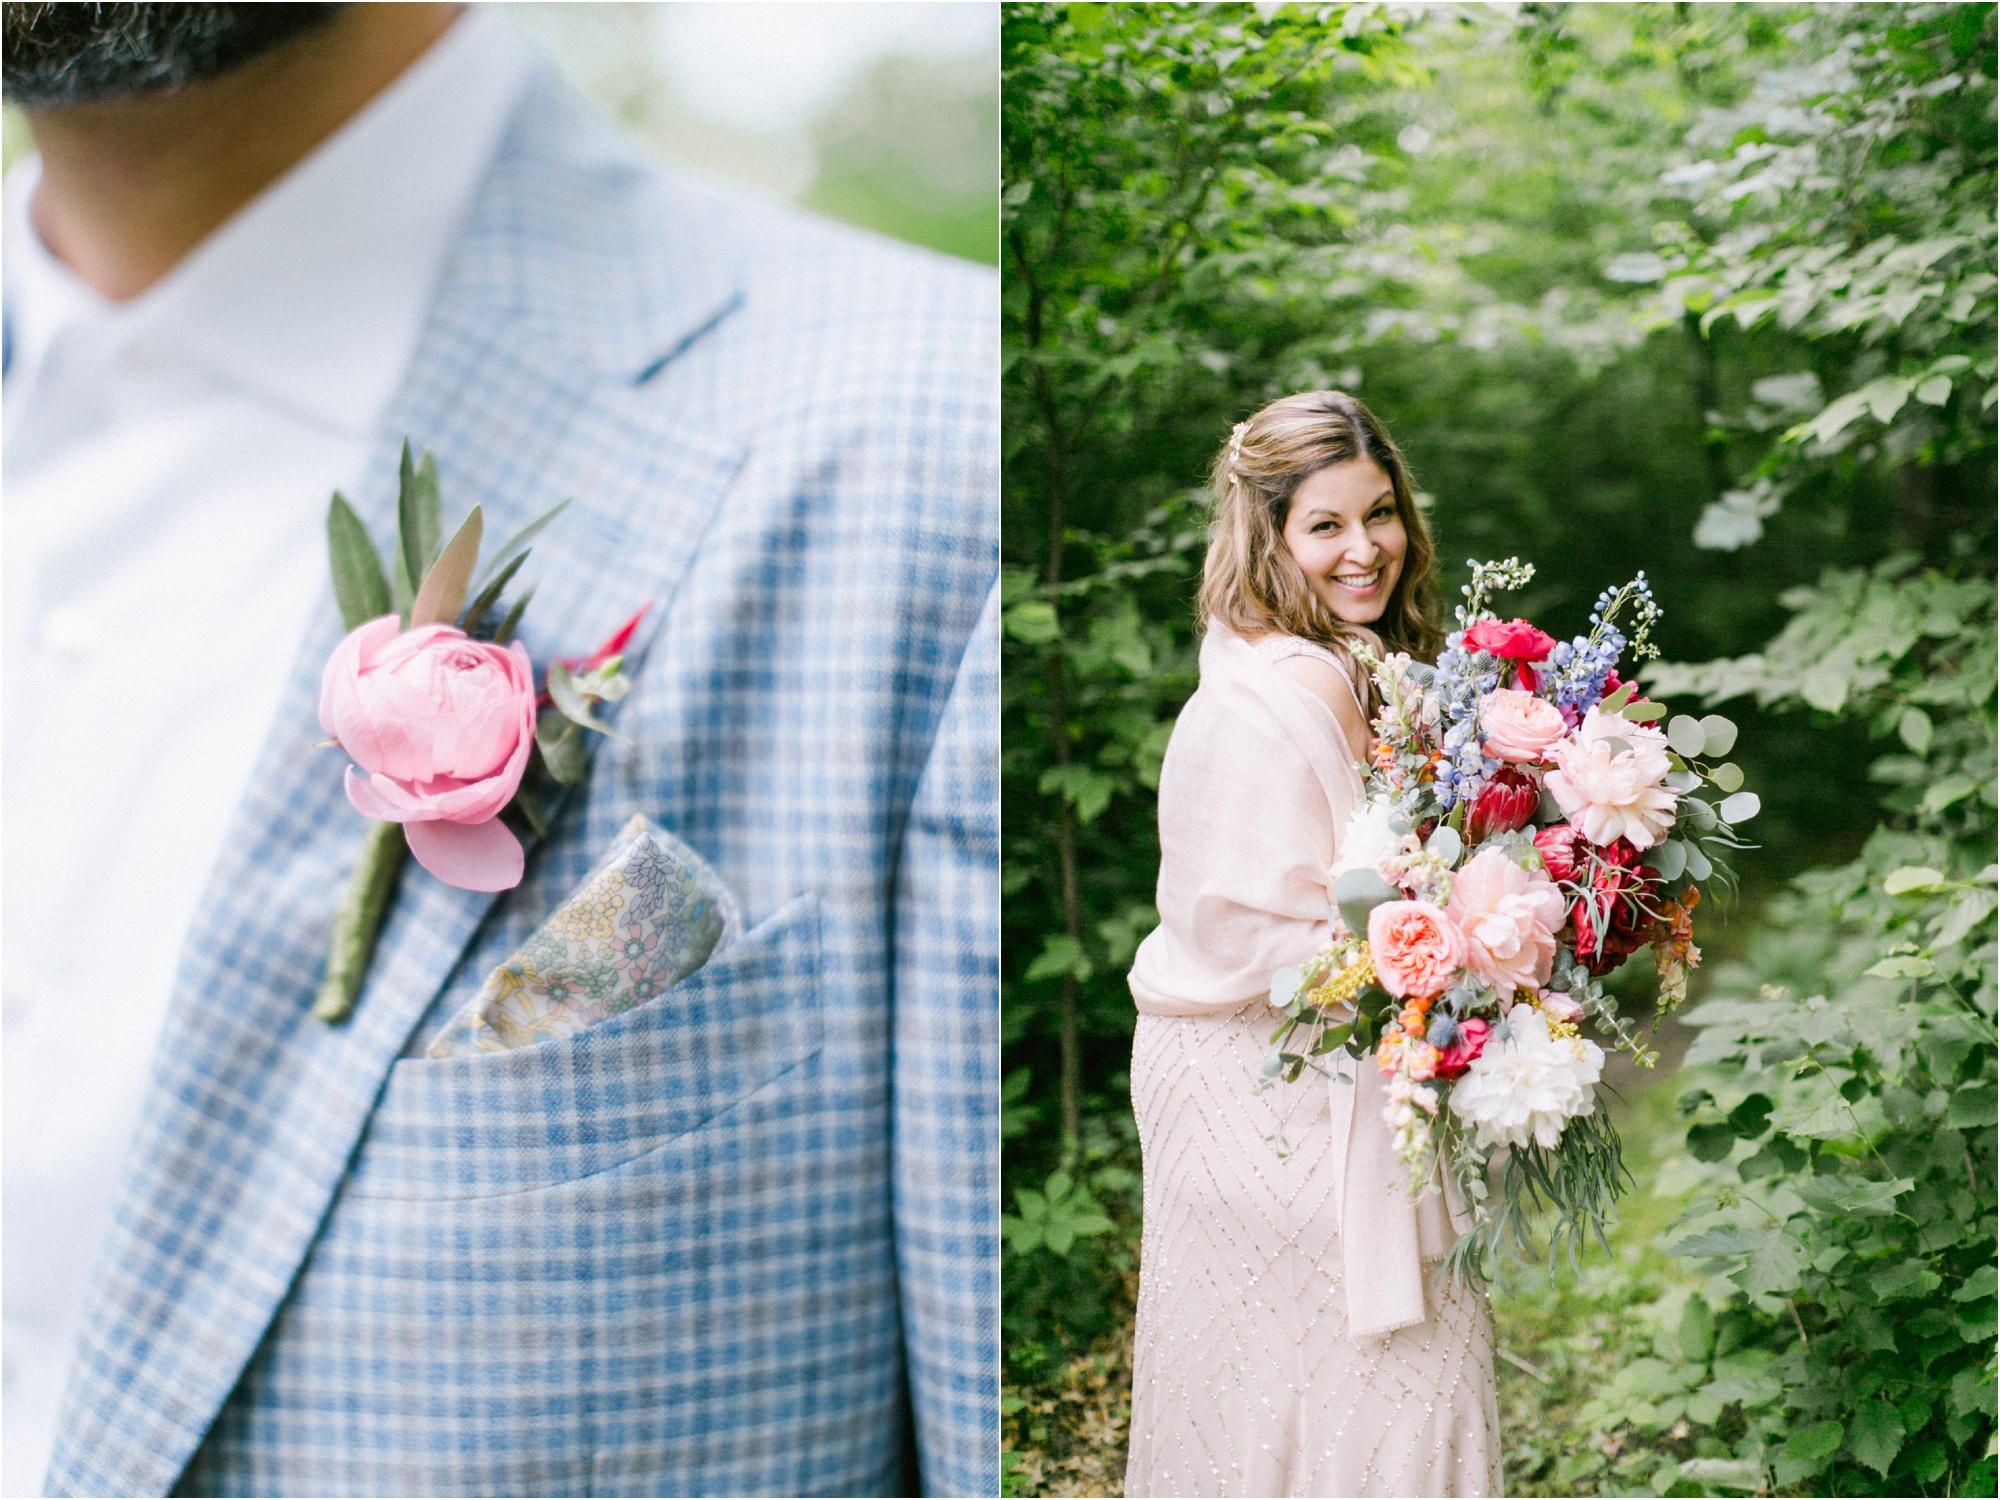 Wedding Photography Brainerd MN Aimee Jobe Photography Private Lake Residence Bloom Designs_0011.jpg